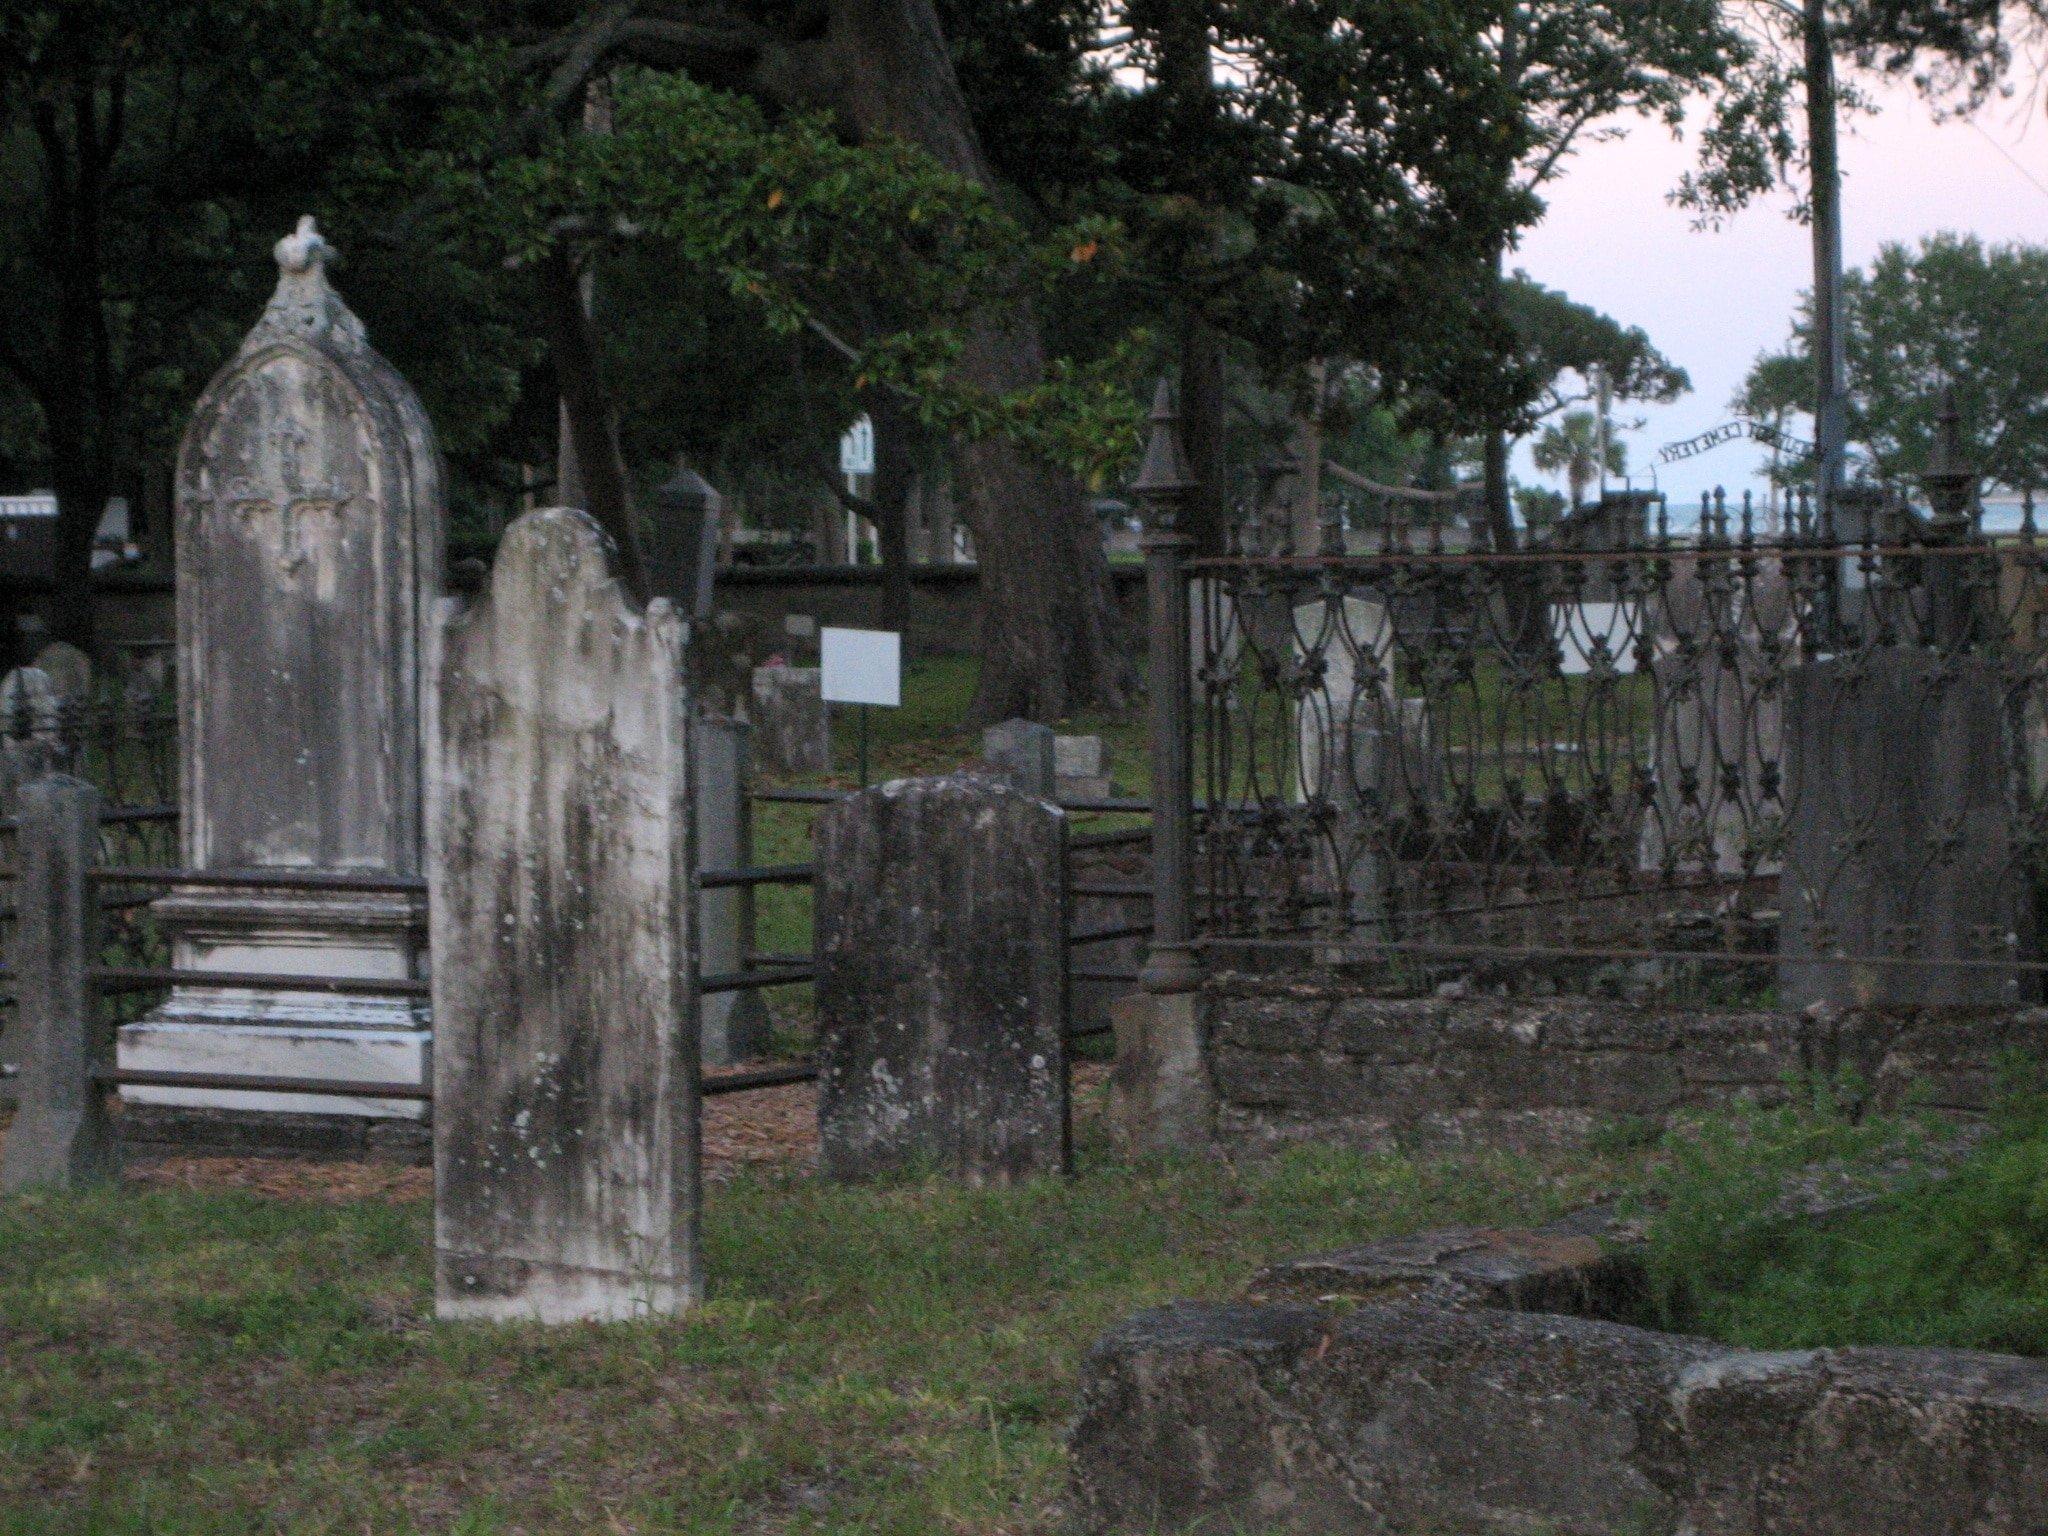 Huguenot Cemetery madeinaday.com